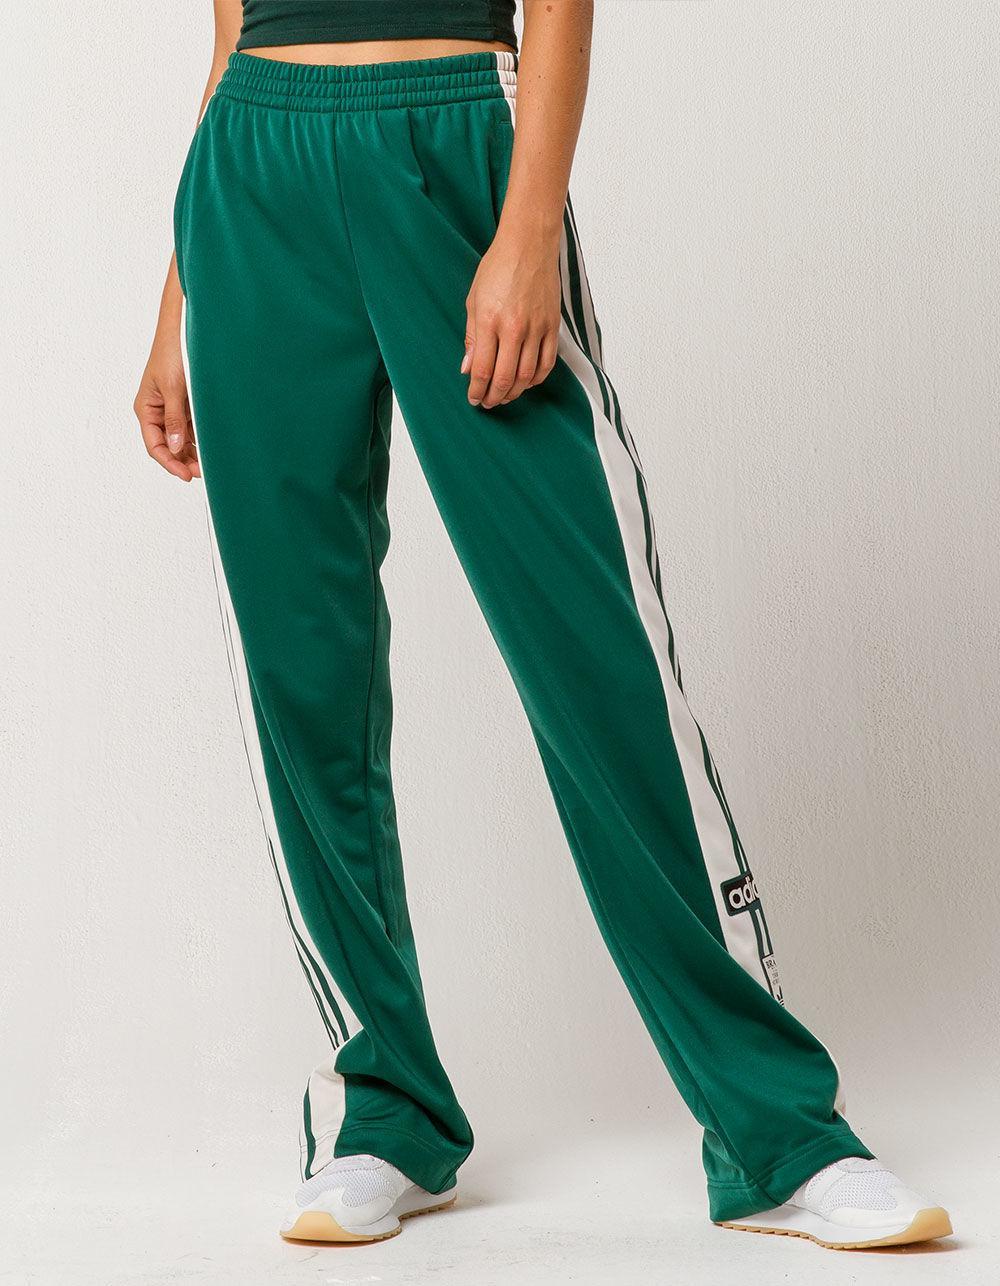 e28960cca9352 Adidas - Green Adibreak Womens Track Pants - Lyst. View fullscreen